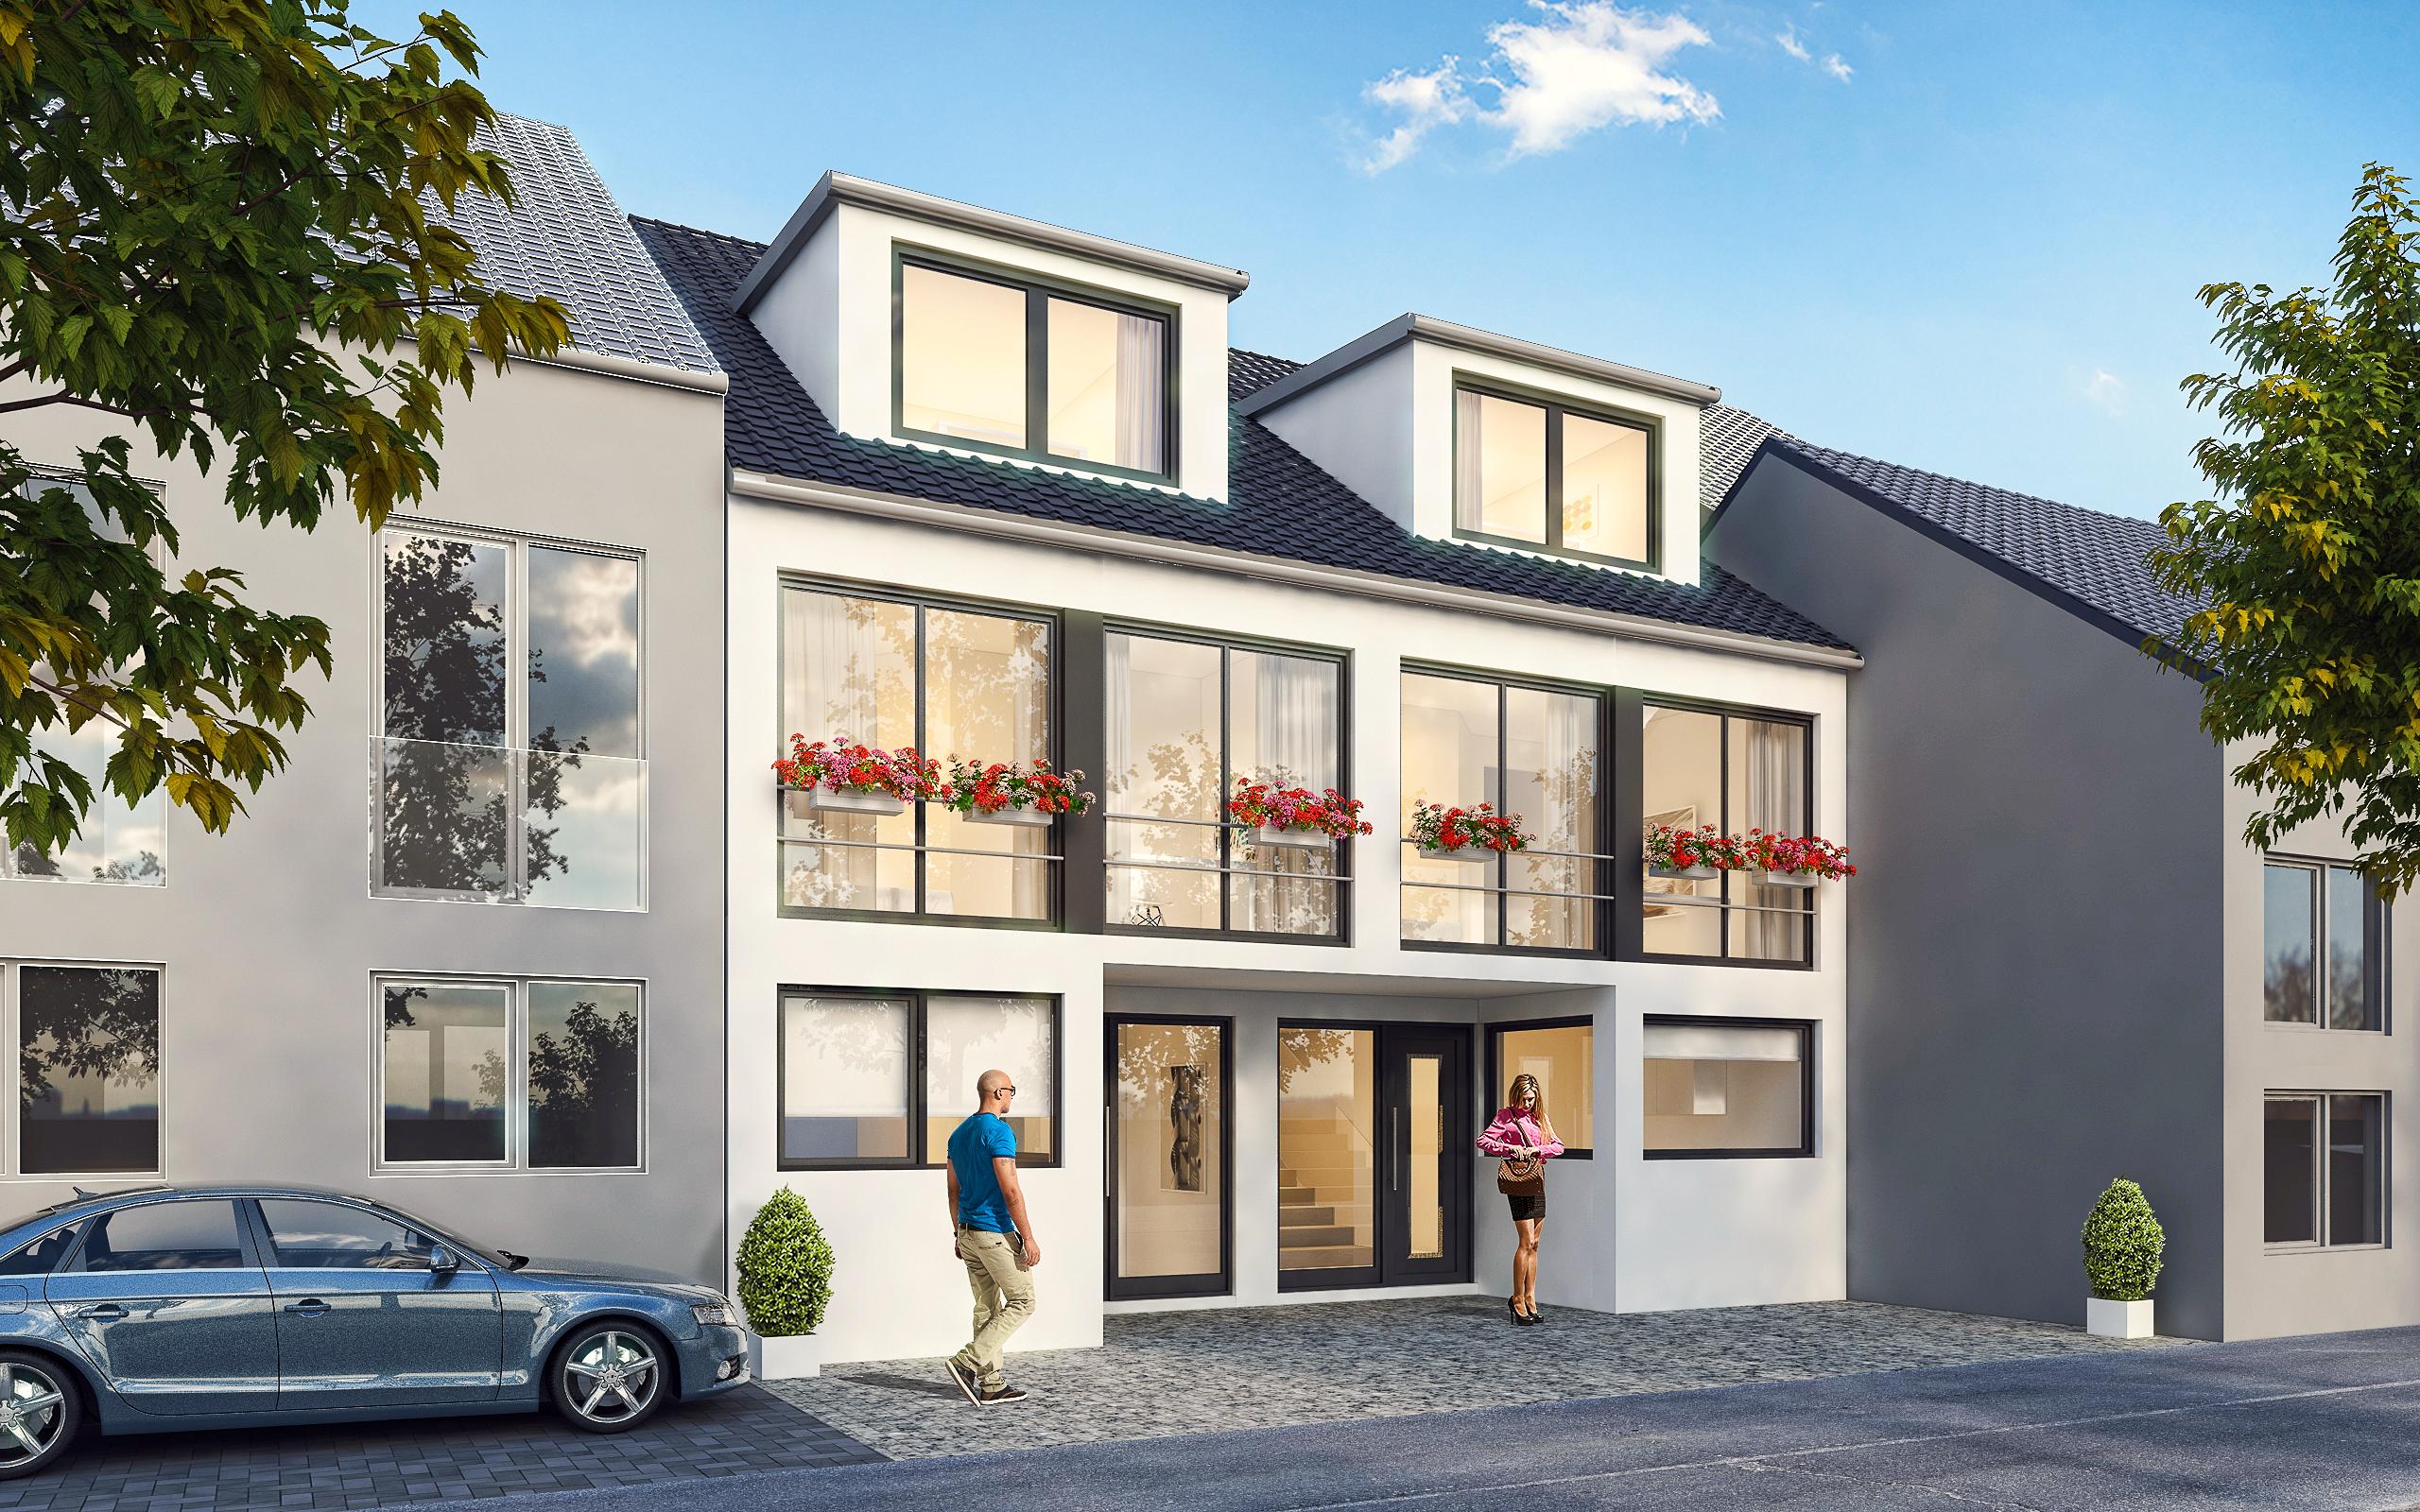 Neubau-Projektierung in Bonn | Bernd Schulz Immobilien